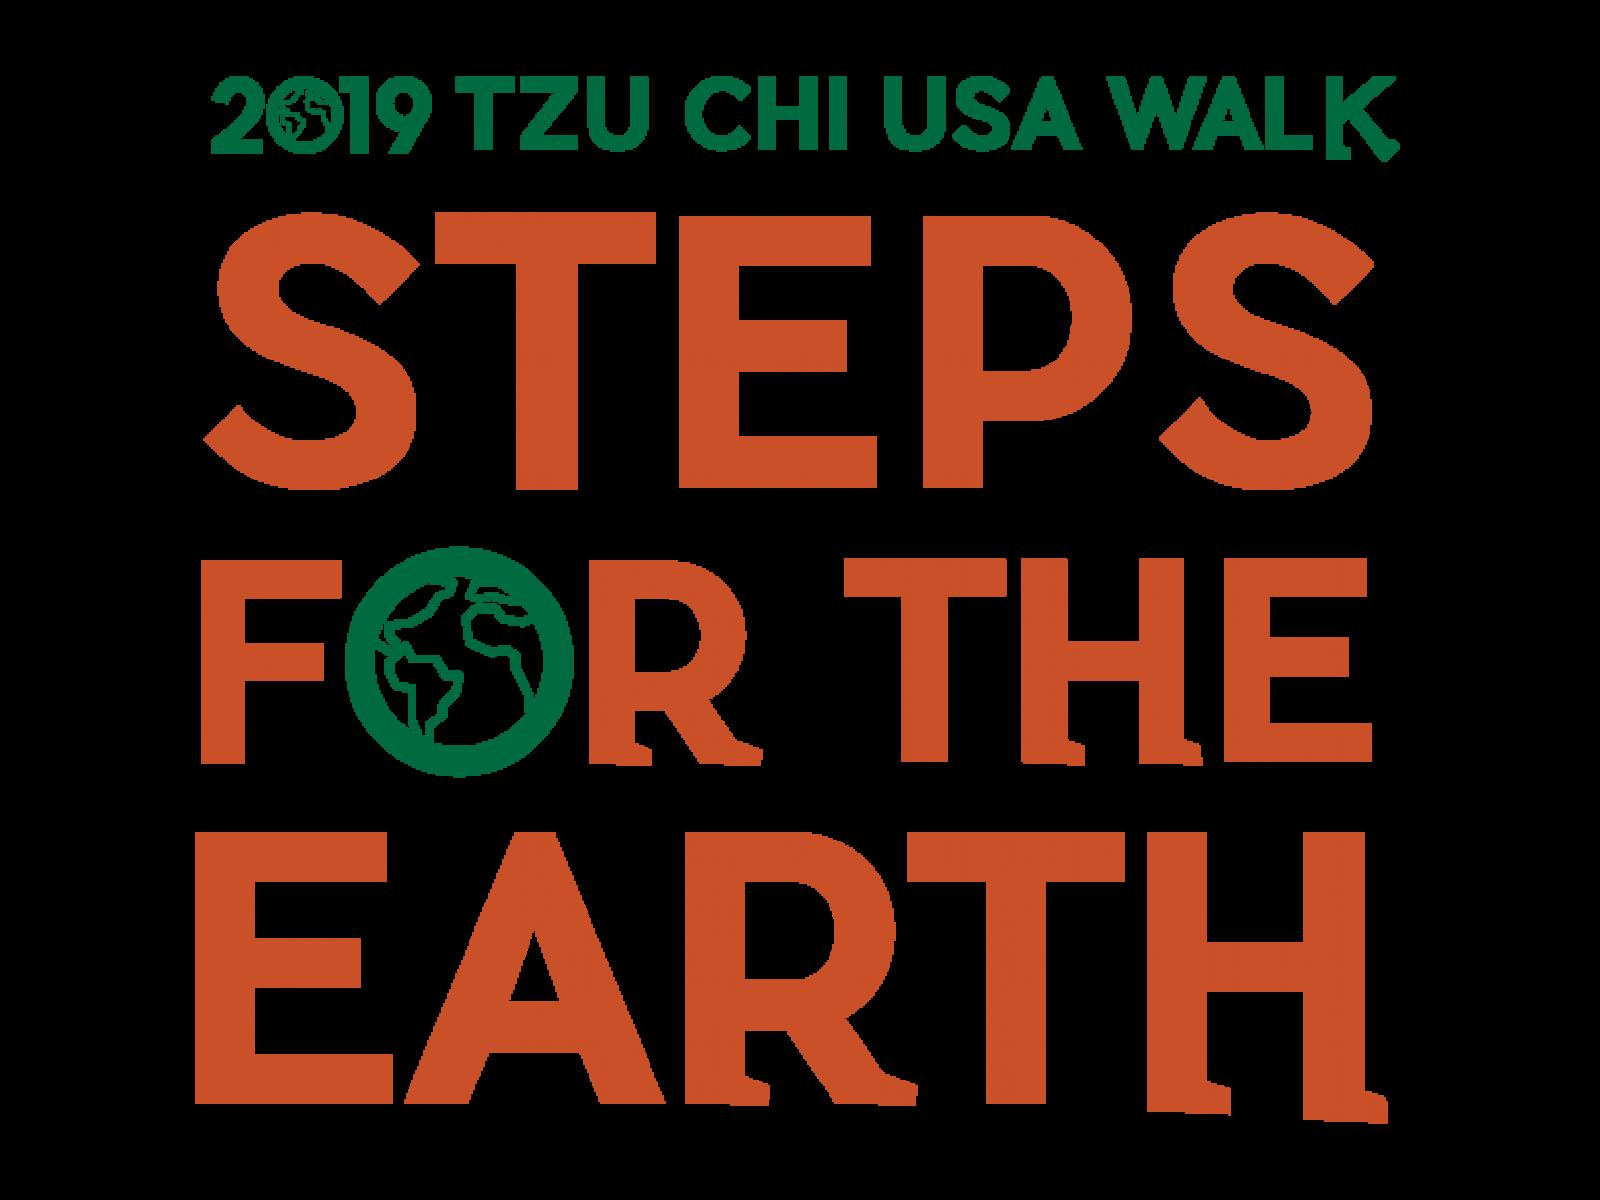 Tzu Chi USA Walk